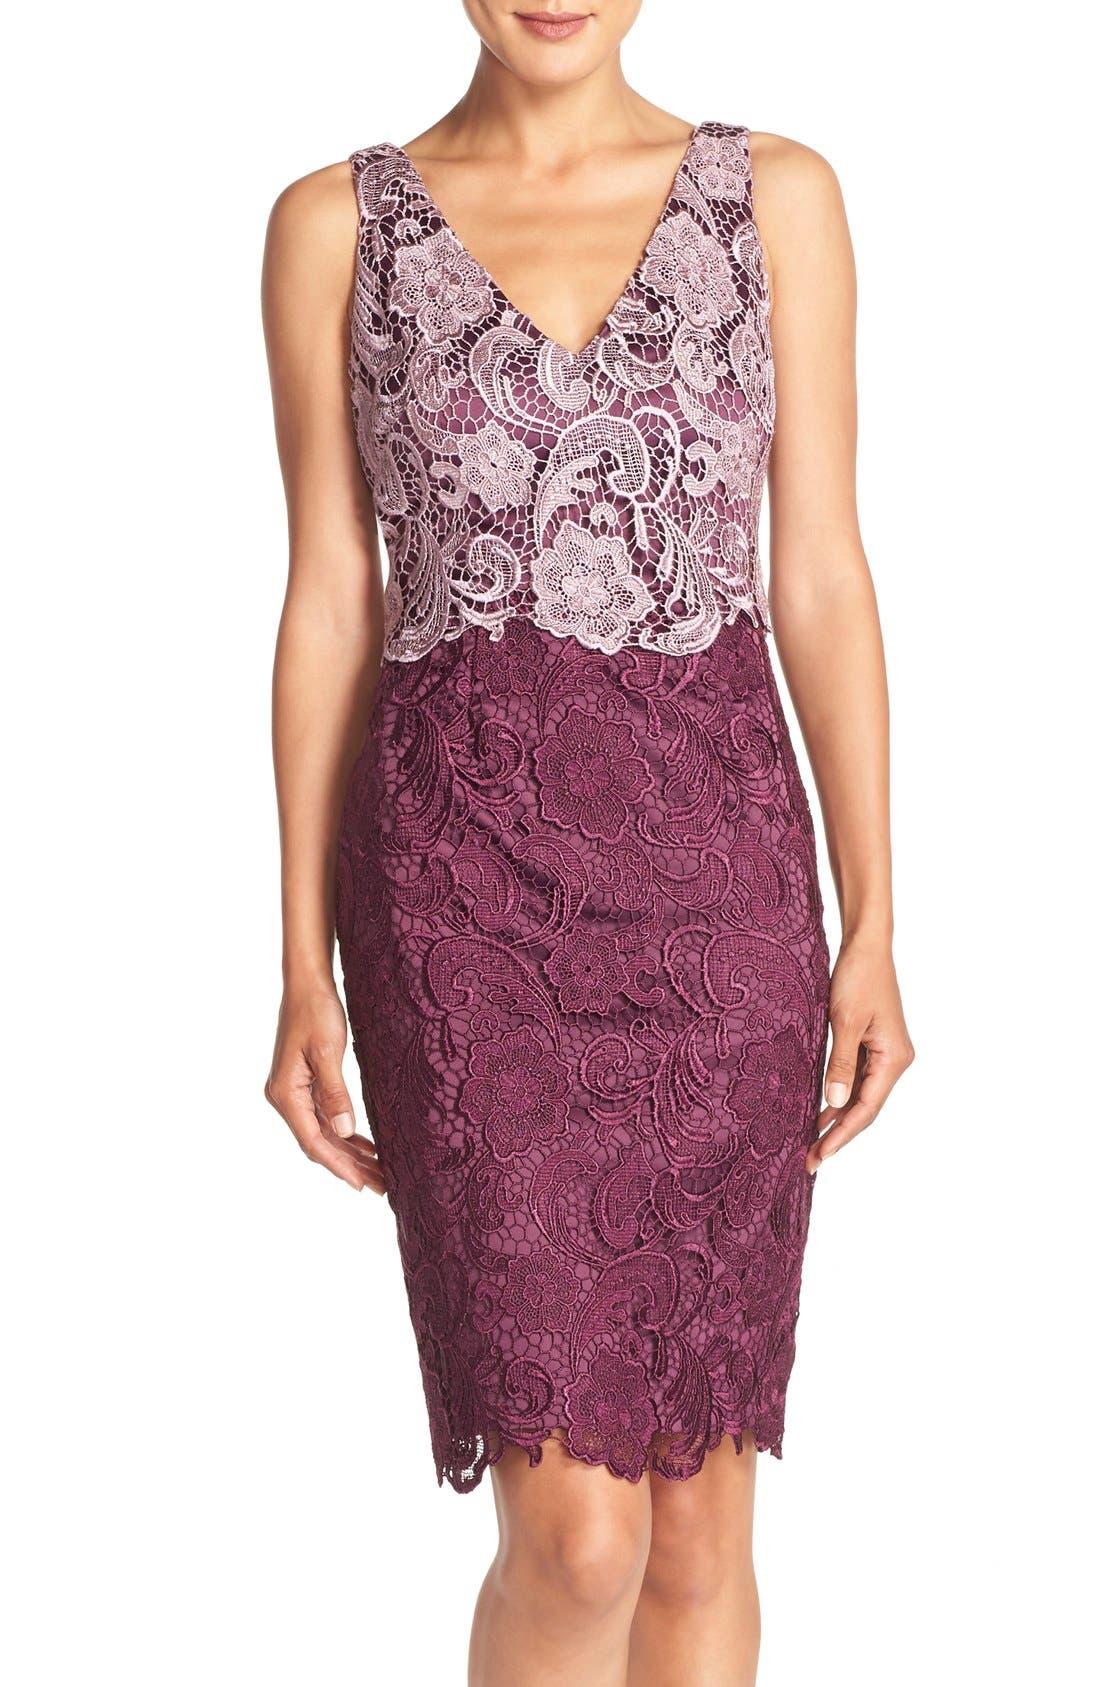 Main Image - Adrianna Papell Colorblock Floral Lace Sheath Dress (Regular & Petite)